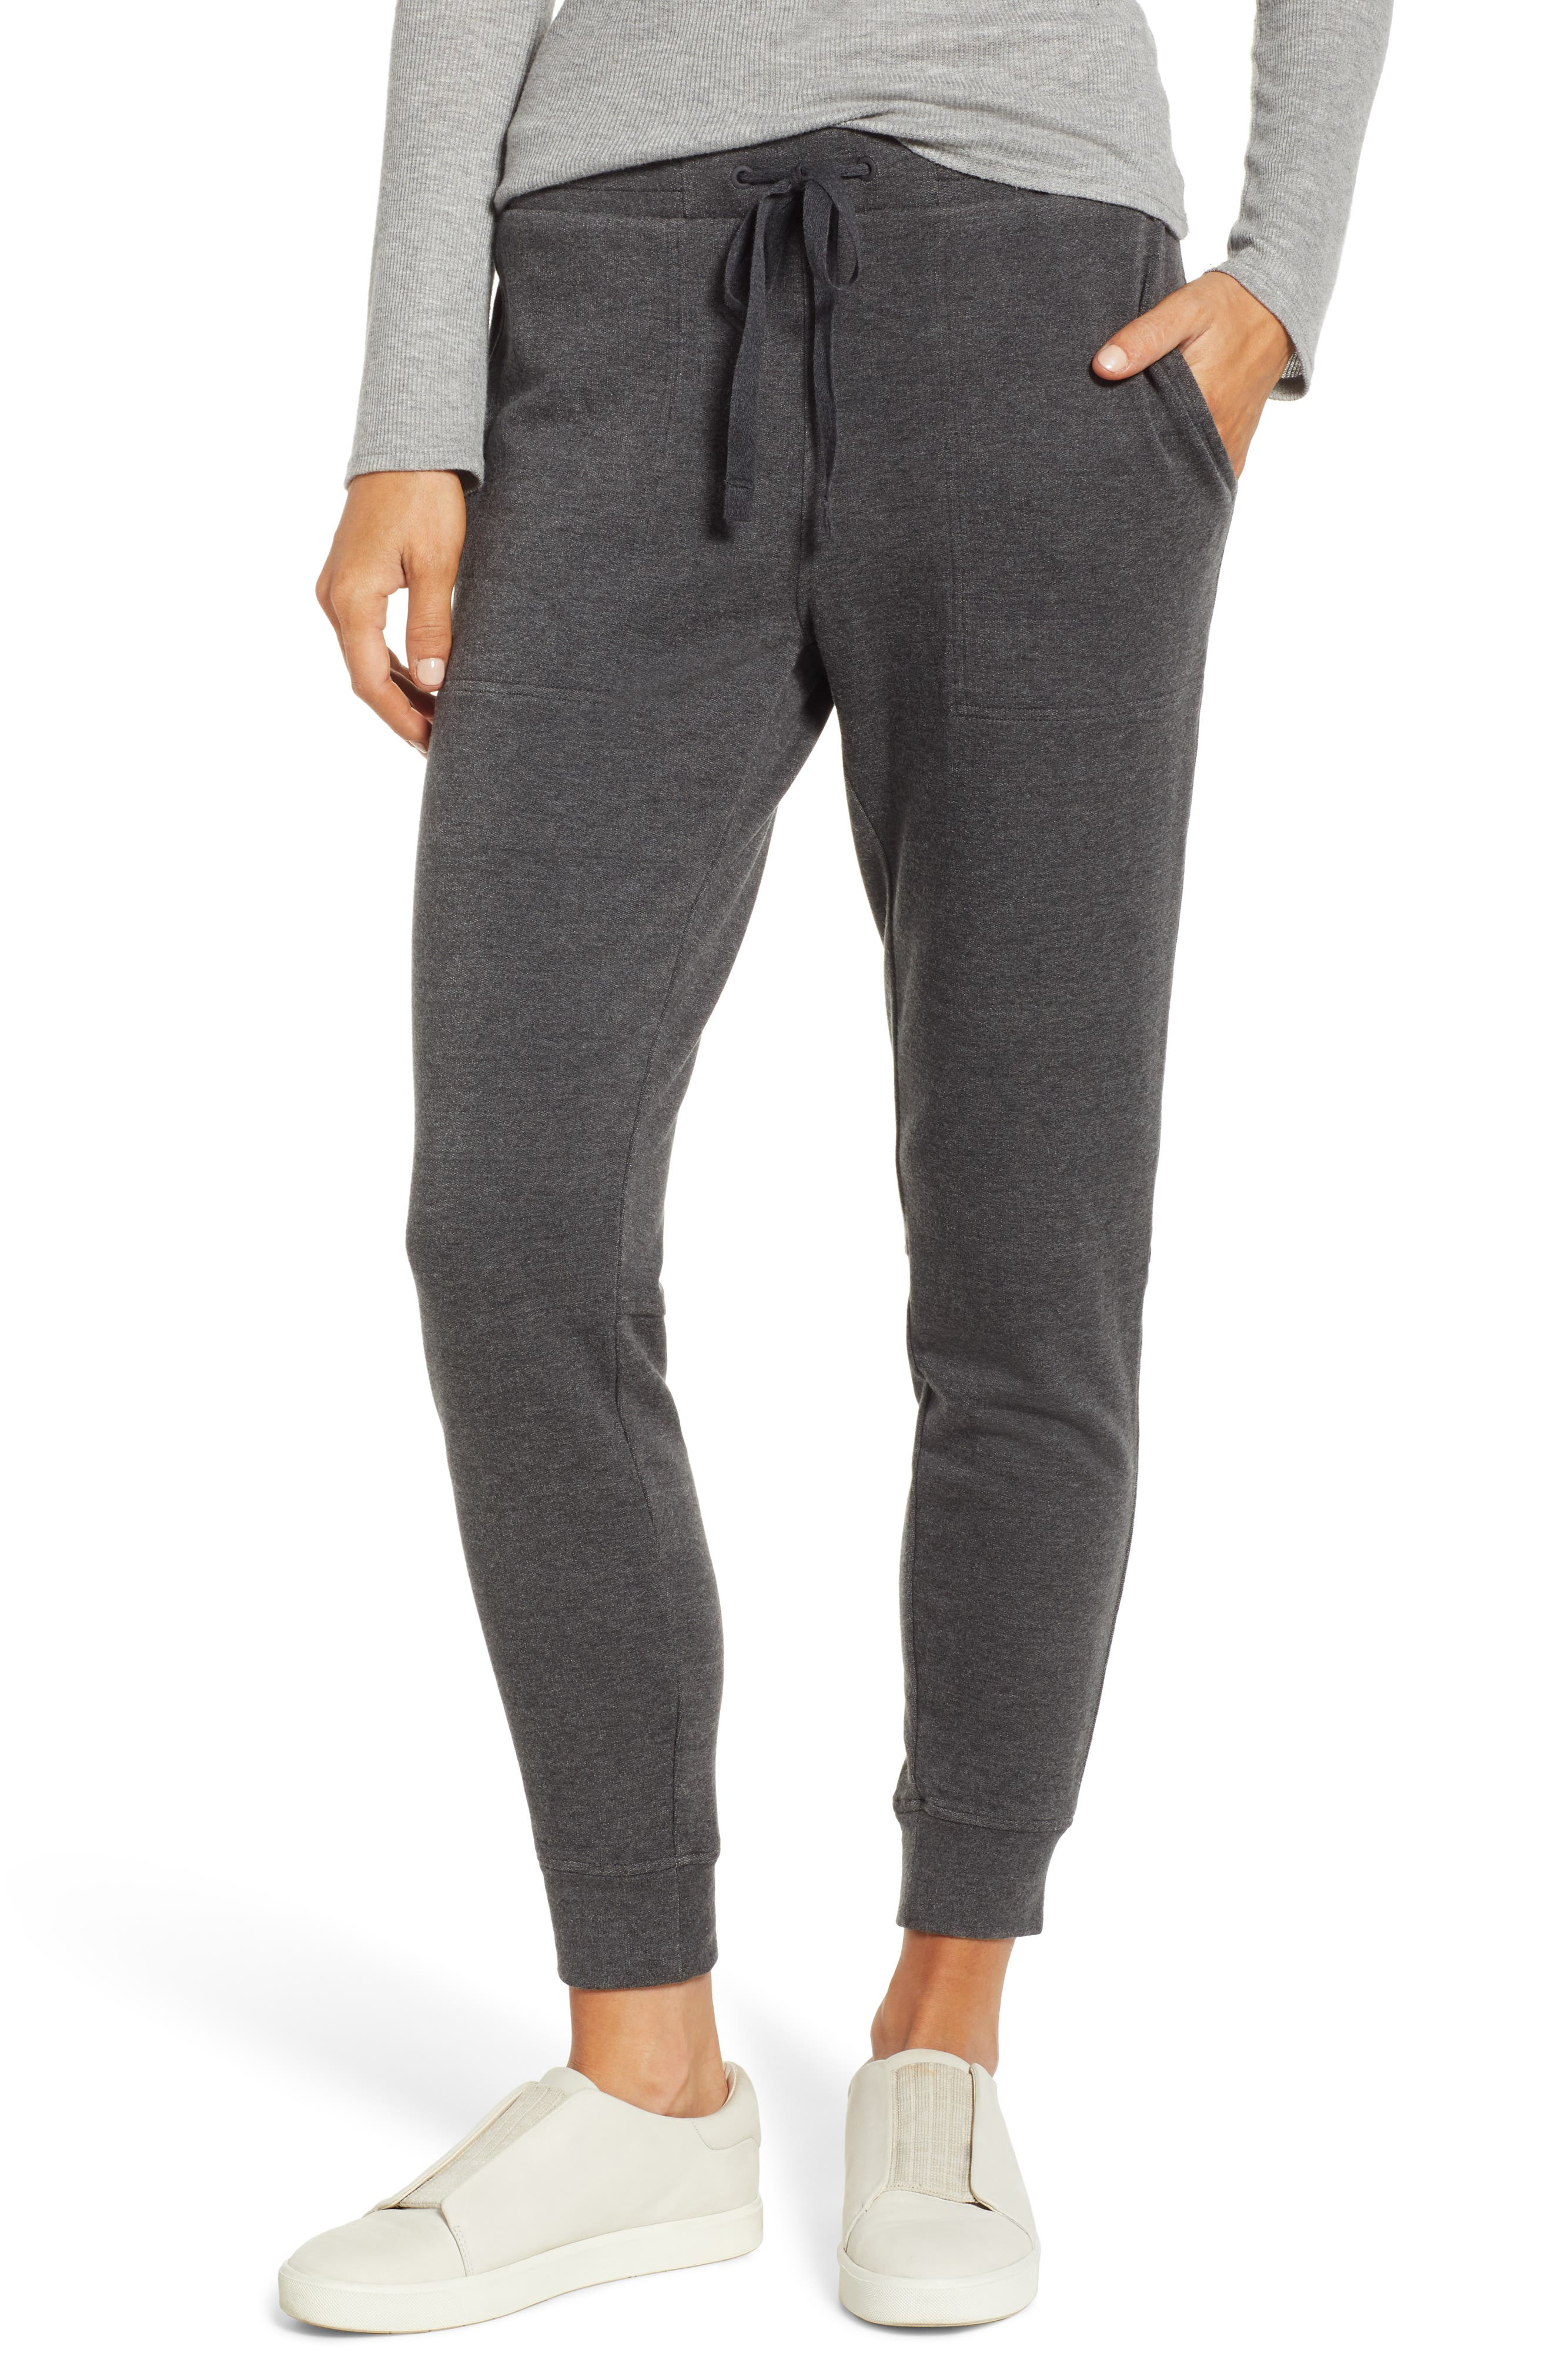 Lou & Grey Zen Bounce Upstate Sweatpants, Grey